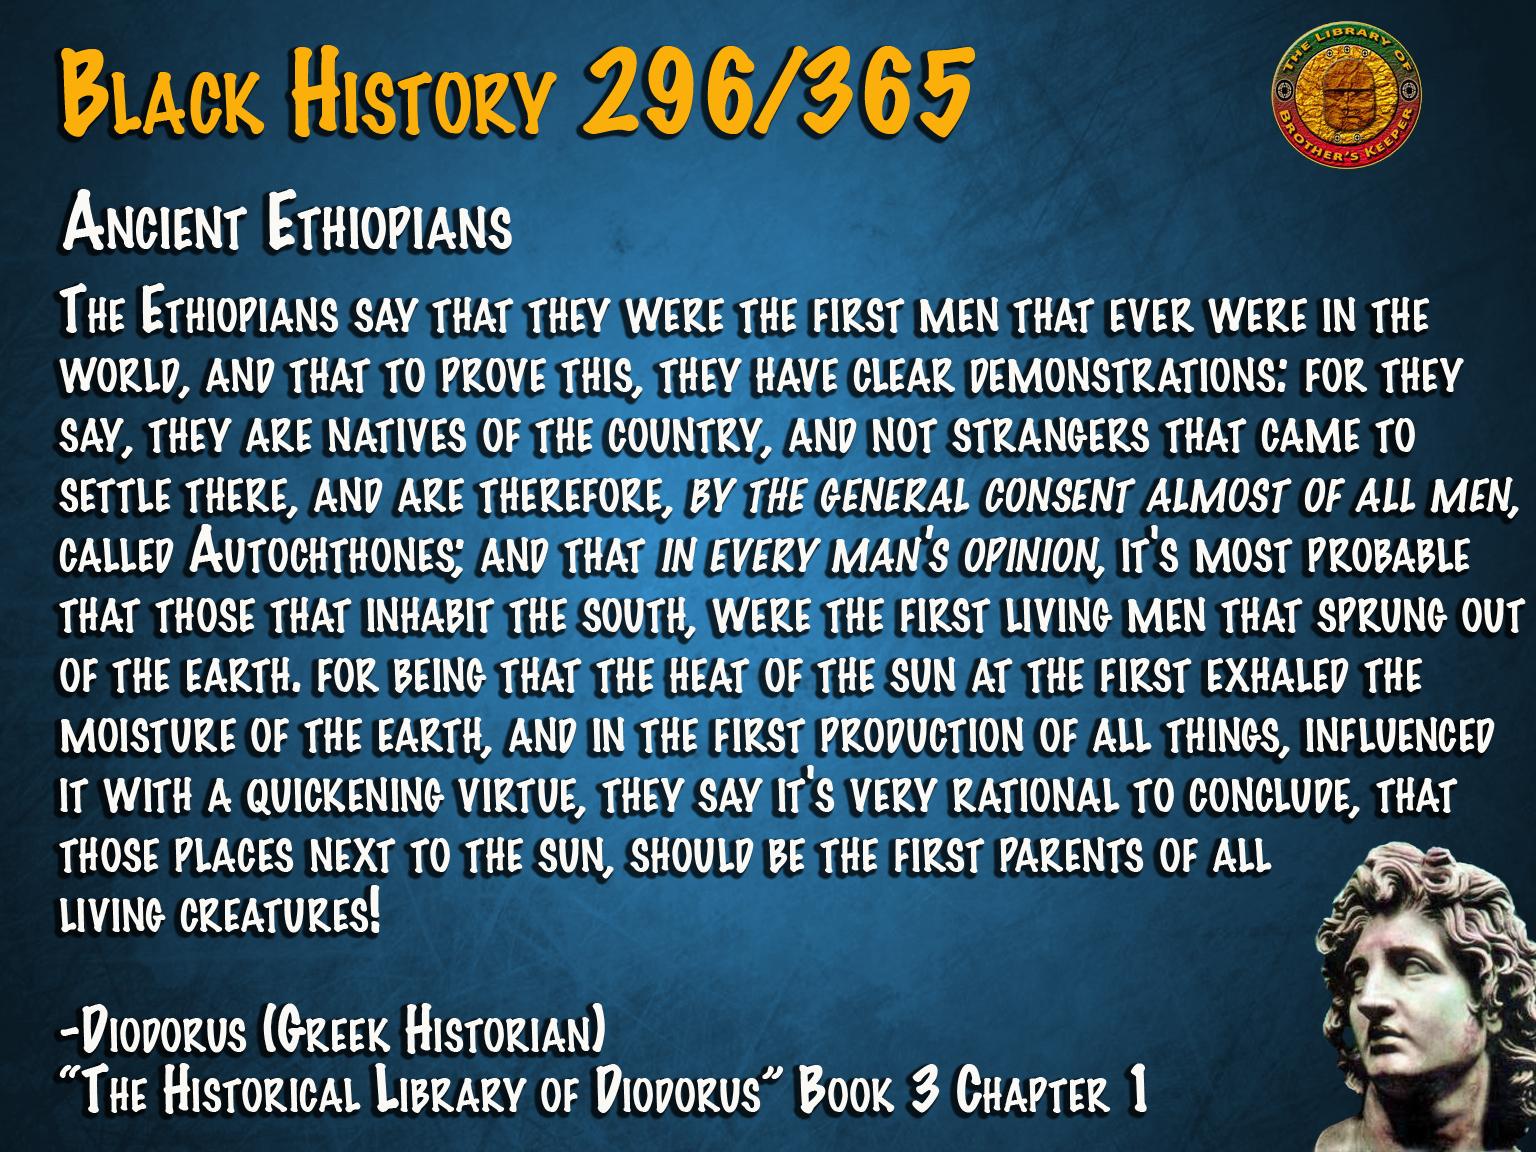 Ancient Ethiopians